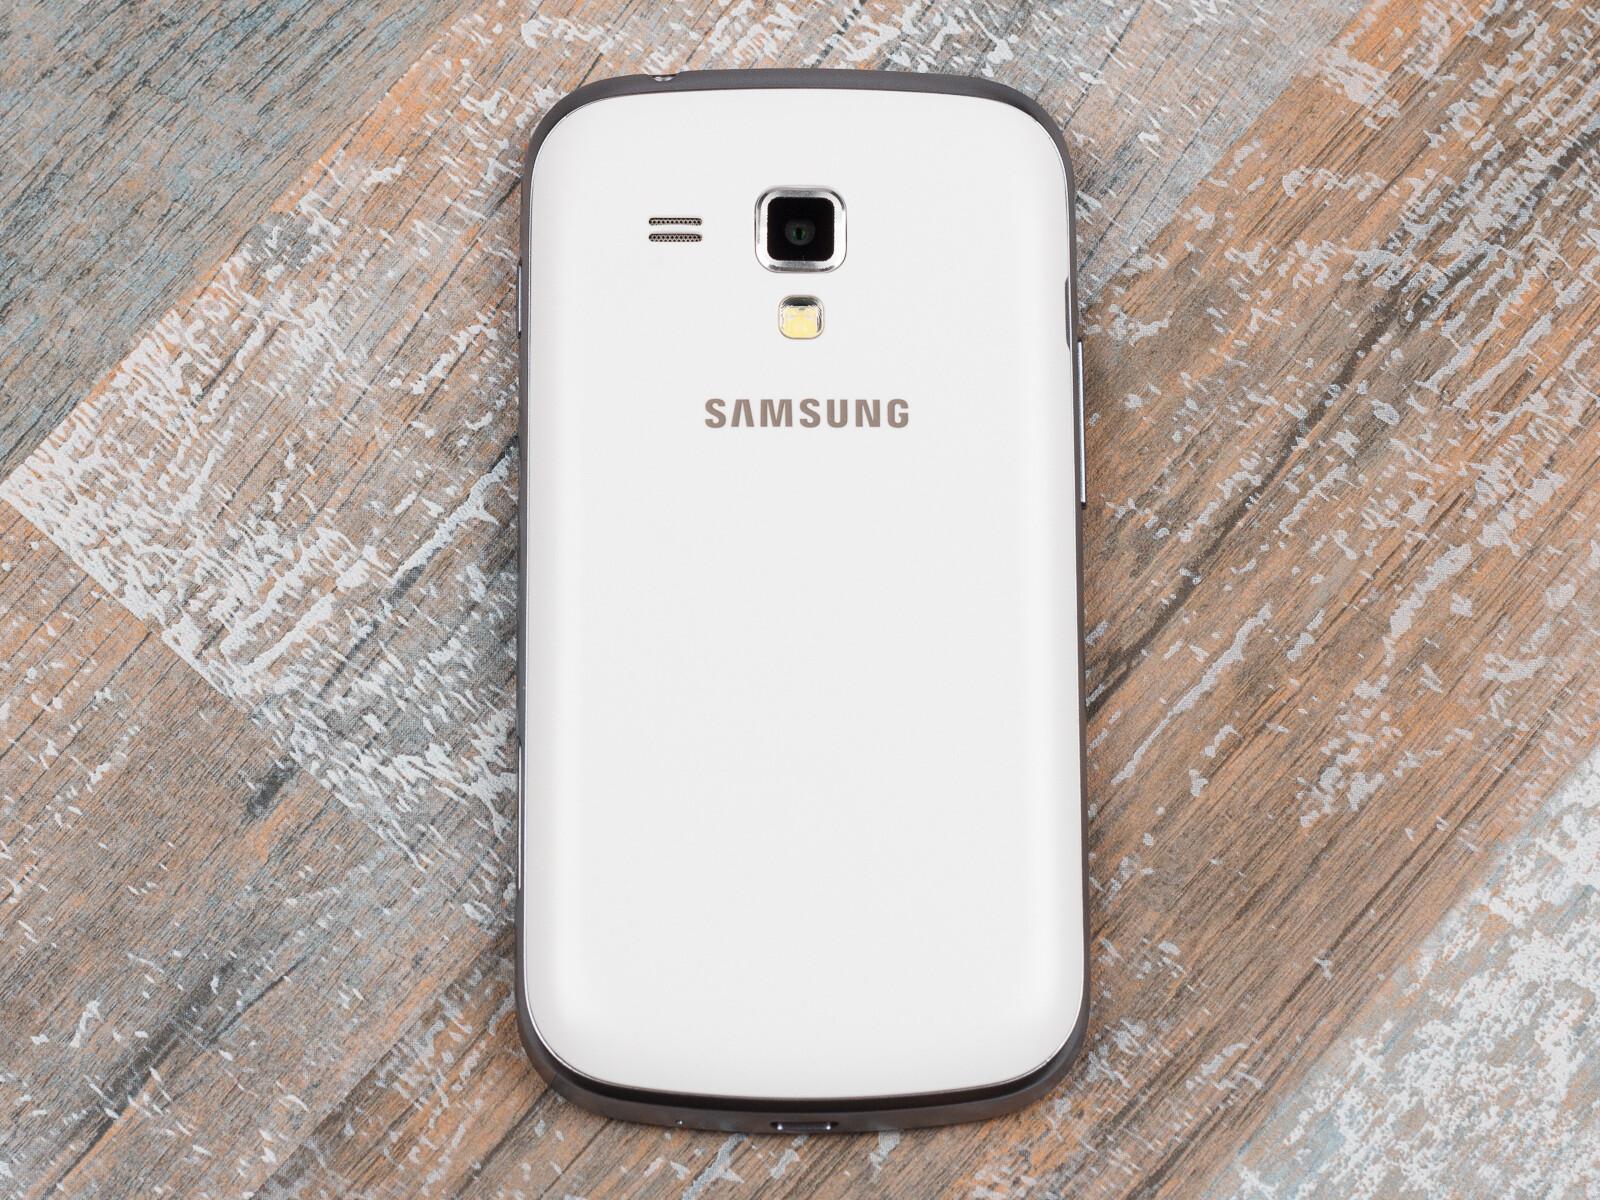 Samsung Galaxy Trend Plus 3